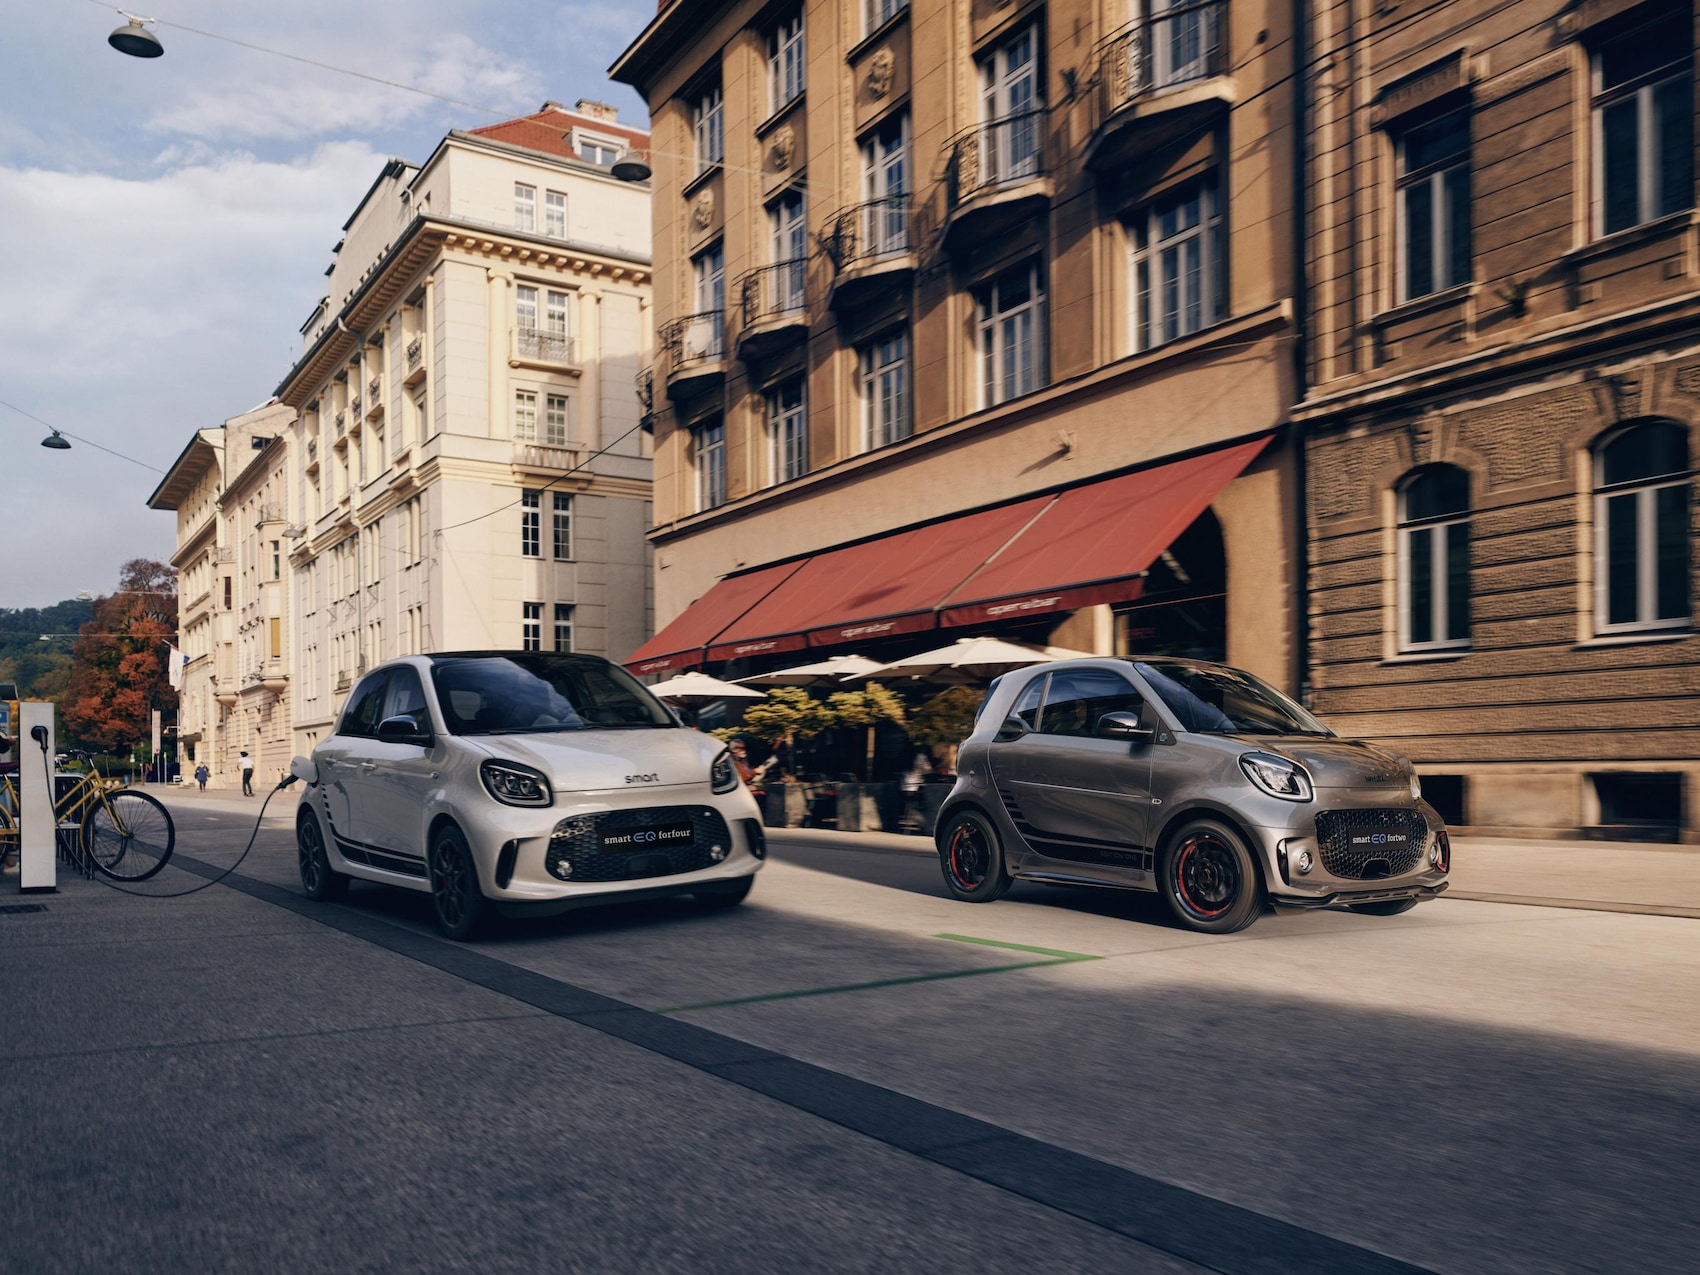 Mercedes-Benz 2021 smart